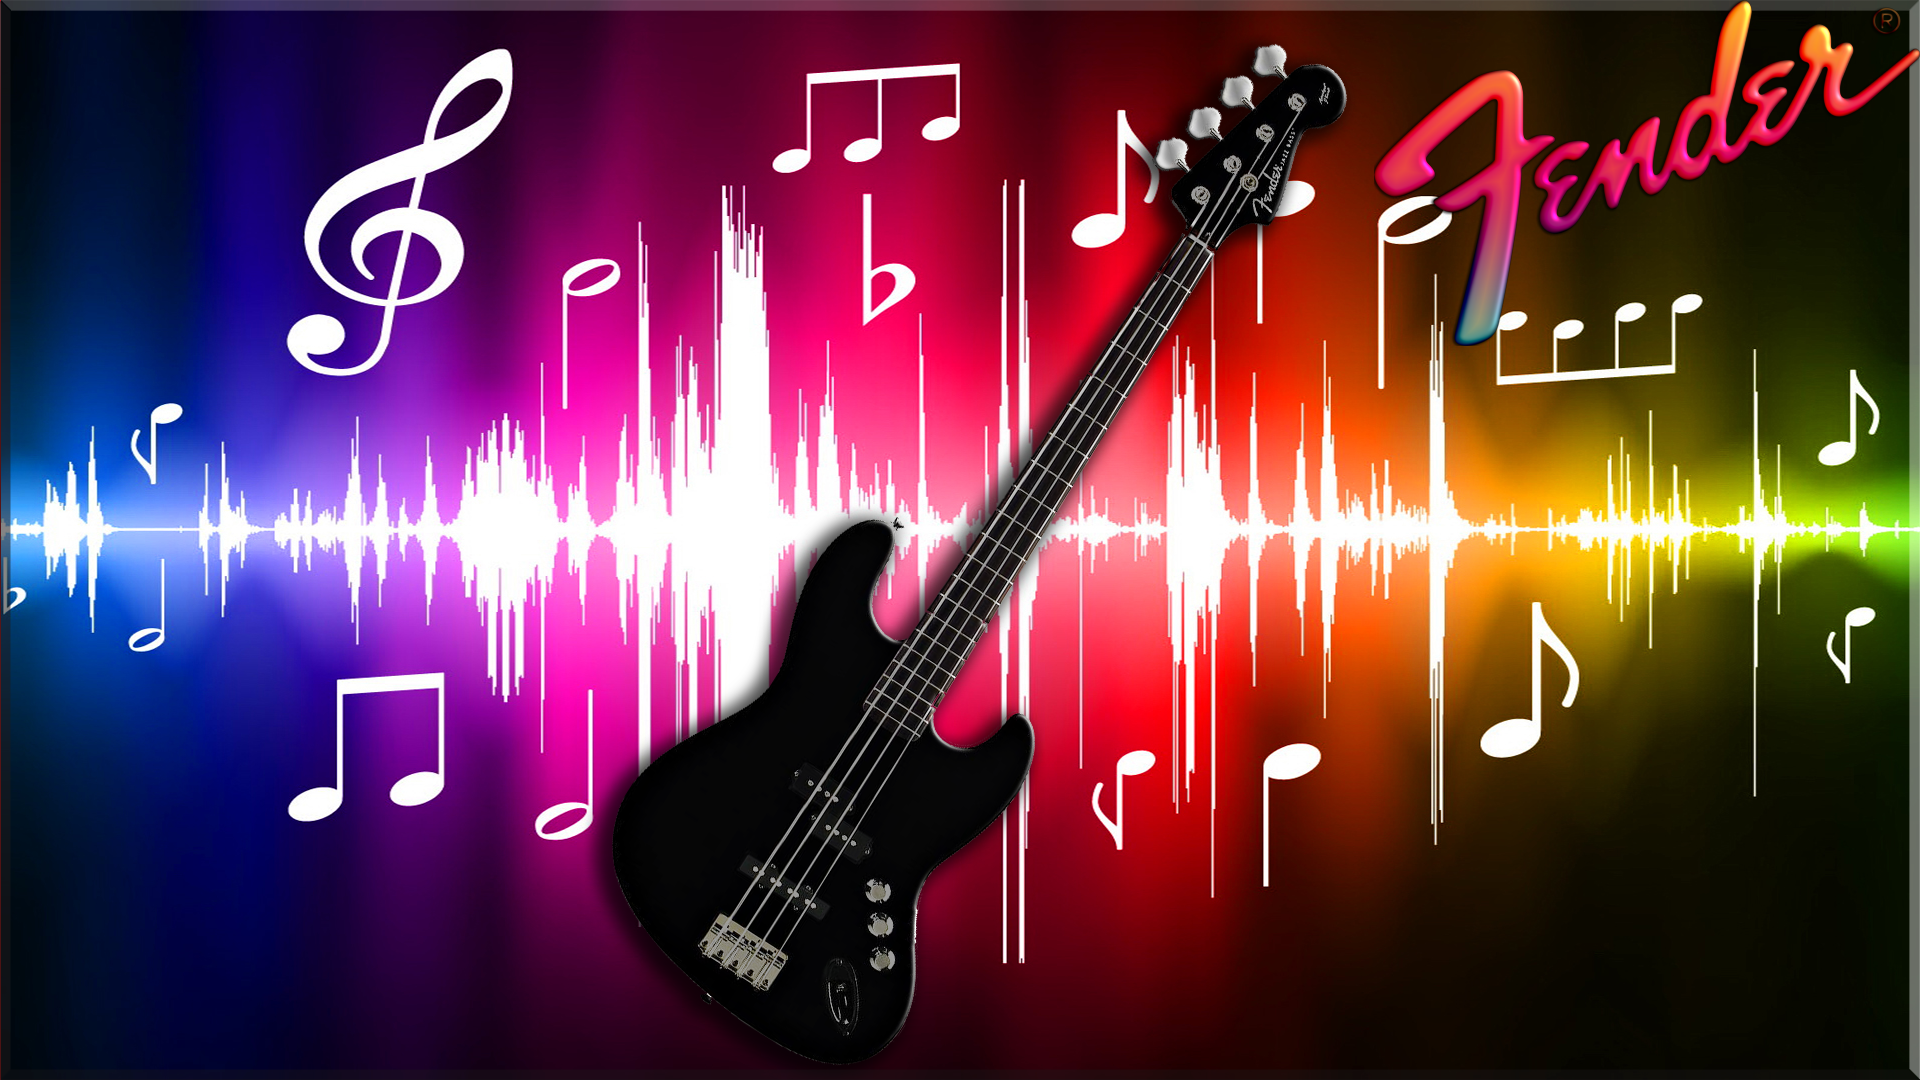 Black Fender Bass Guitar Fondo De Pantalla Hd Fondo De